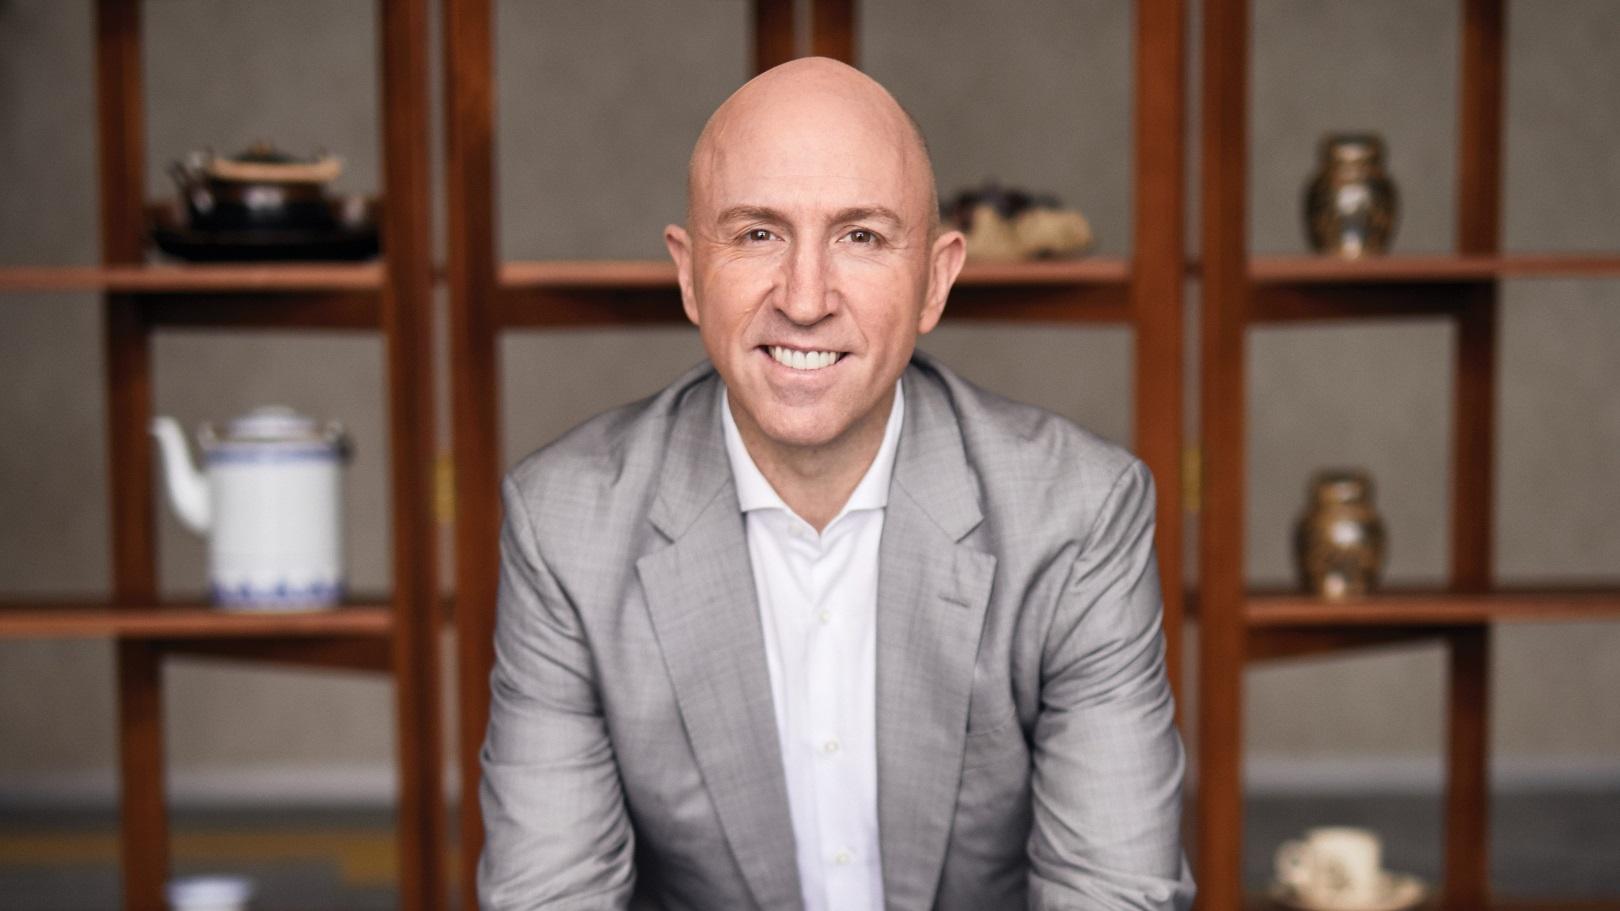 Scott Russell, Member, SAP Executive Board, SAP SE, Customer Success